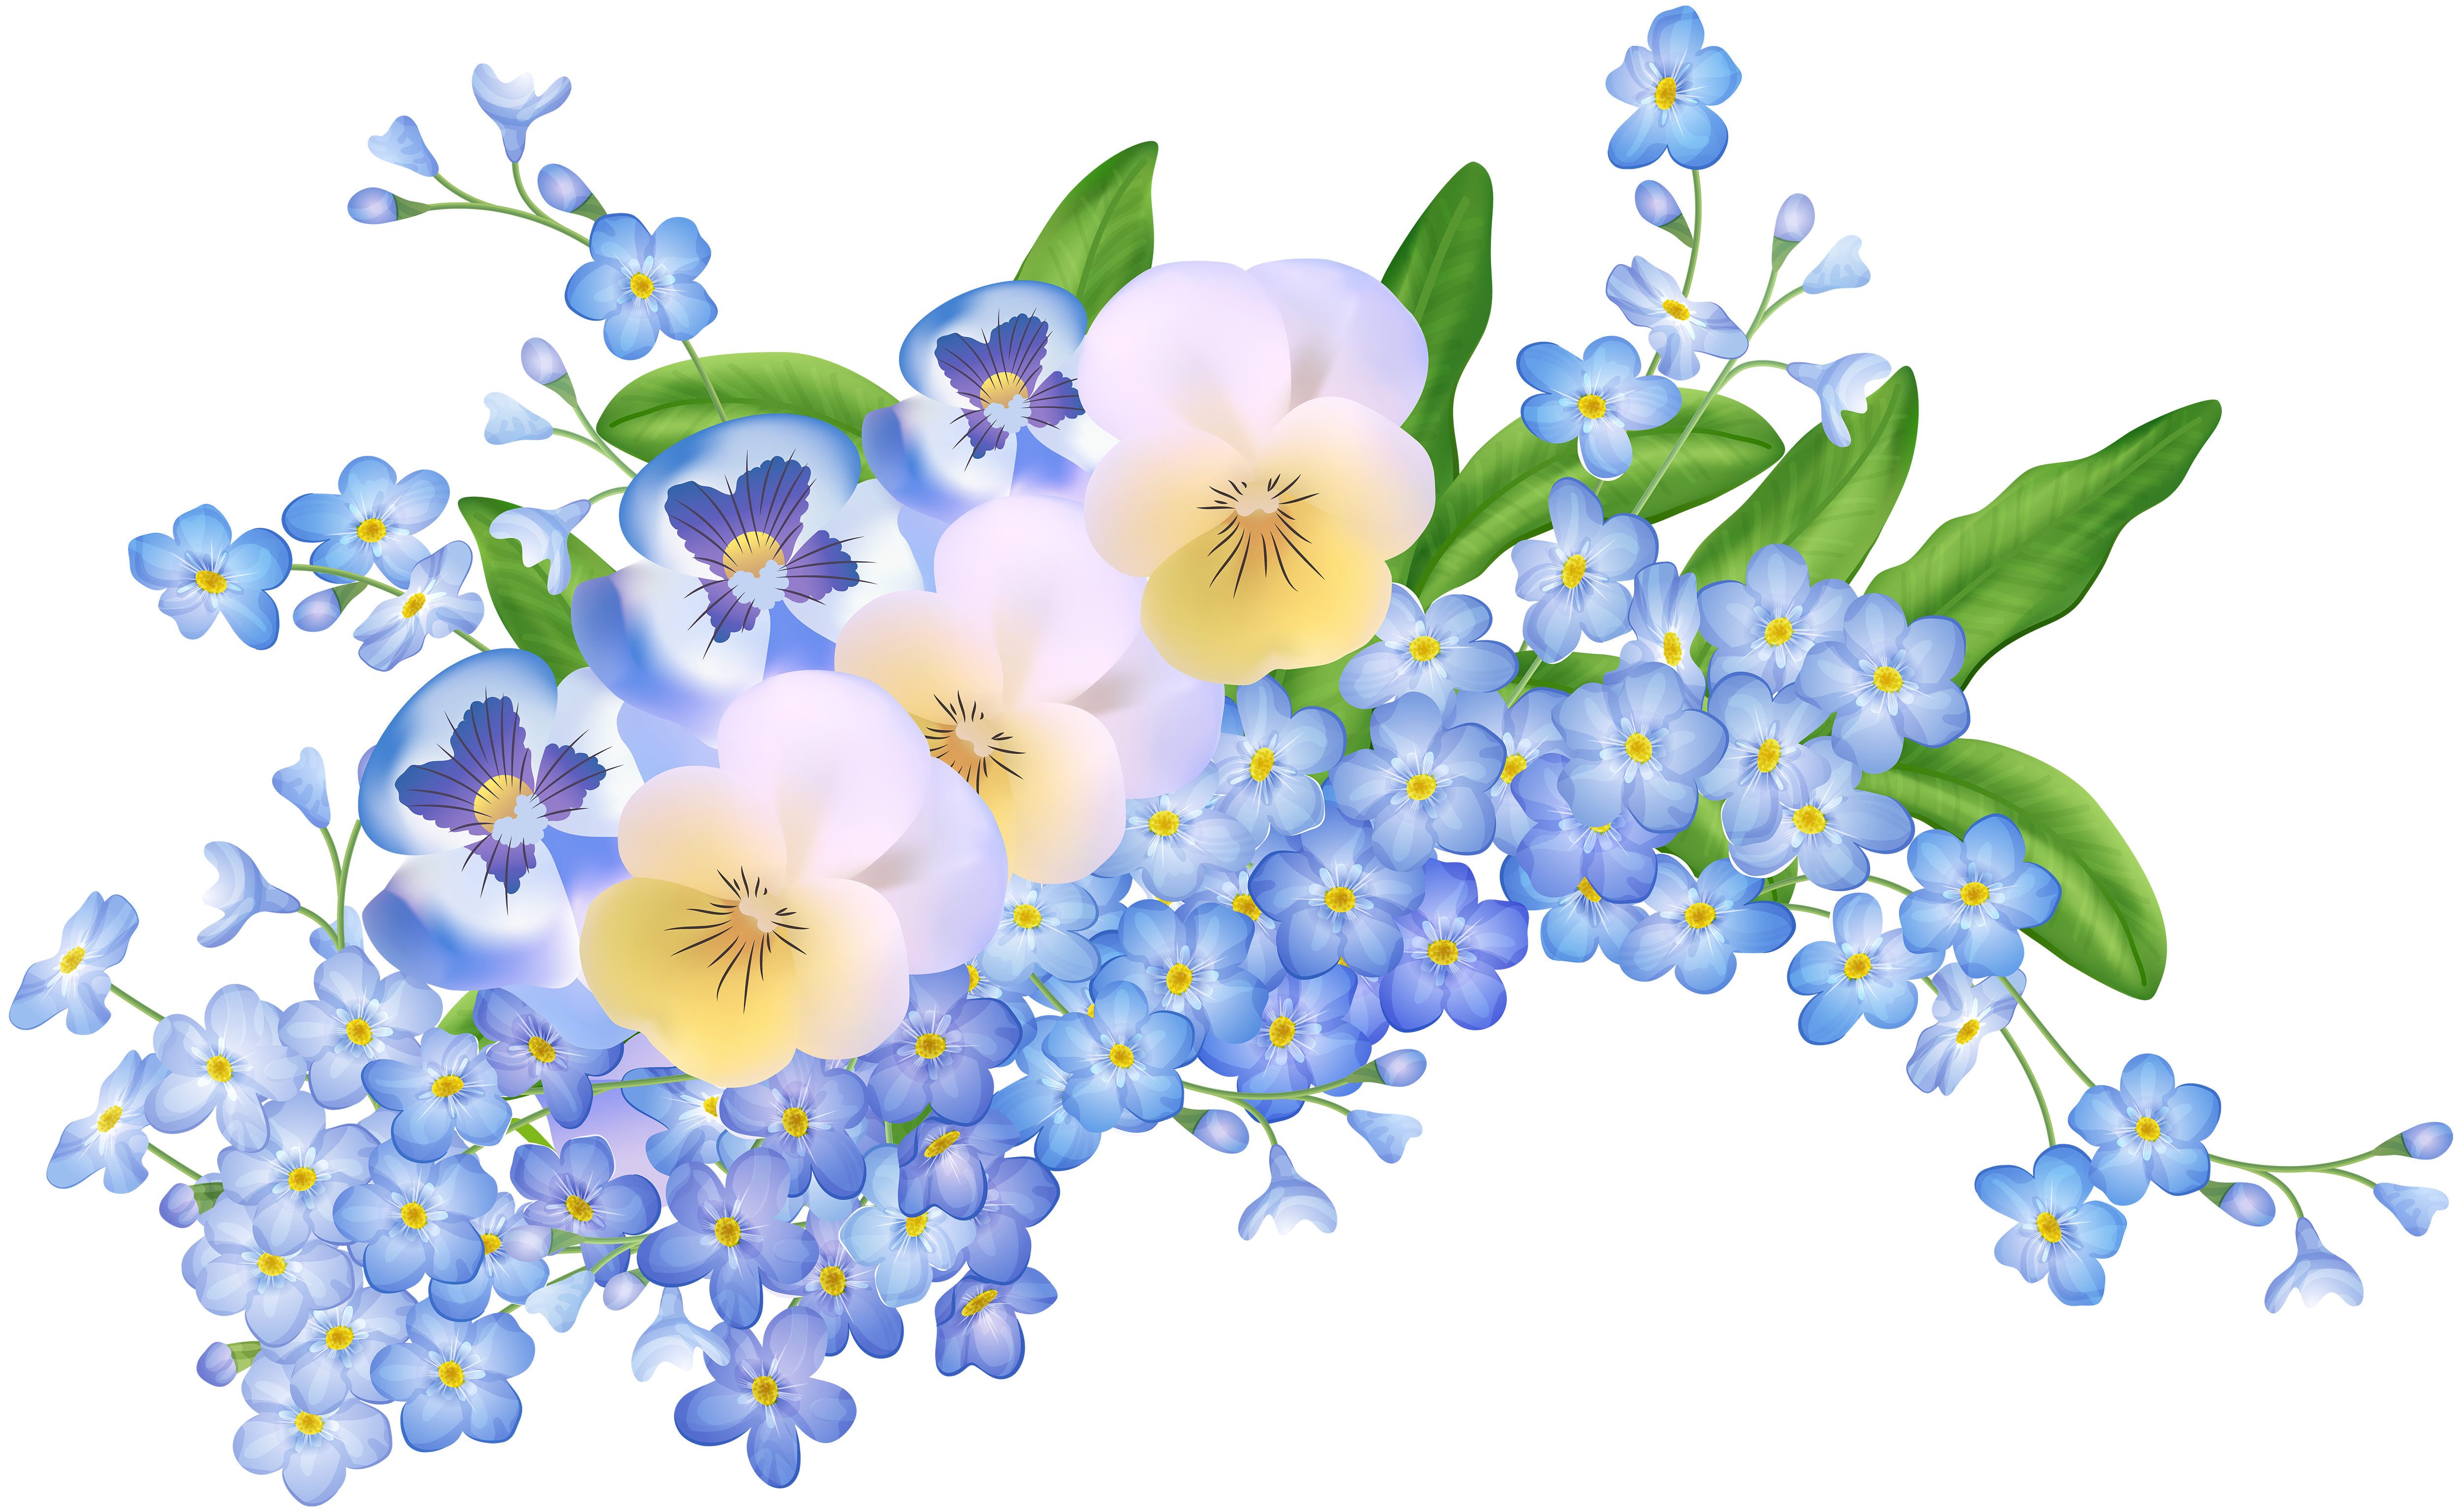 Spring Flowers Decoration Transparent PNG Clip Art Image.